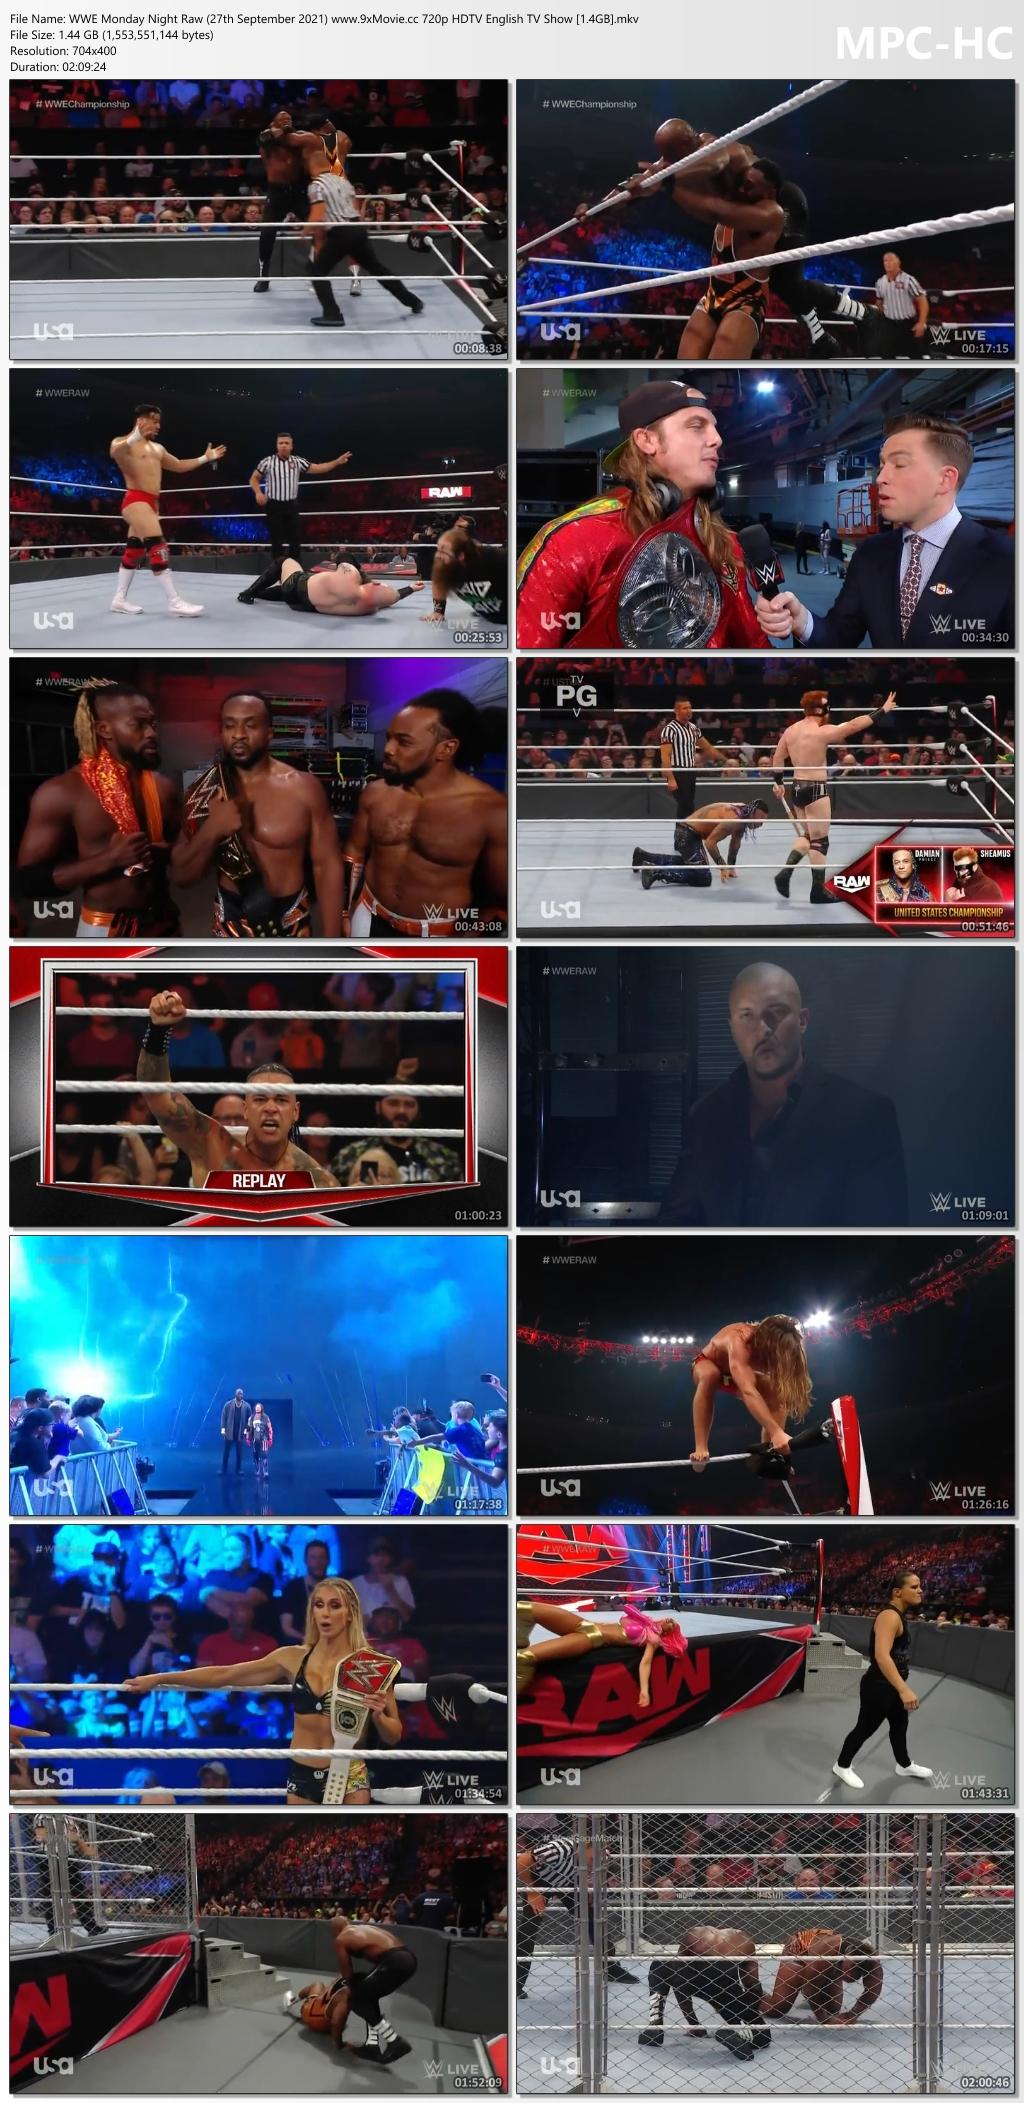 WWE-Monday-Night-Raw-27th-September-2021-www-9x-Movie-cc-720p-HDTV-English-TV-Show-1-4-GB-mkv